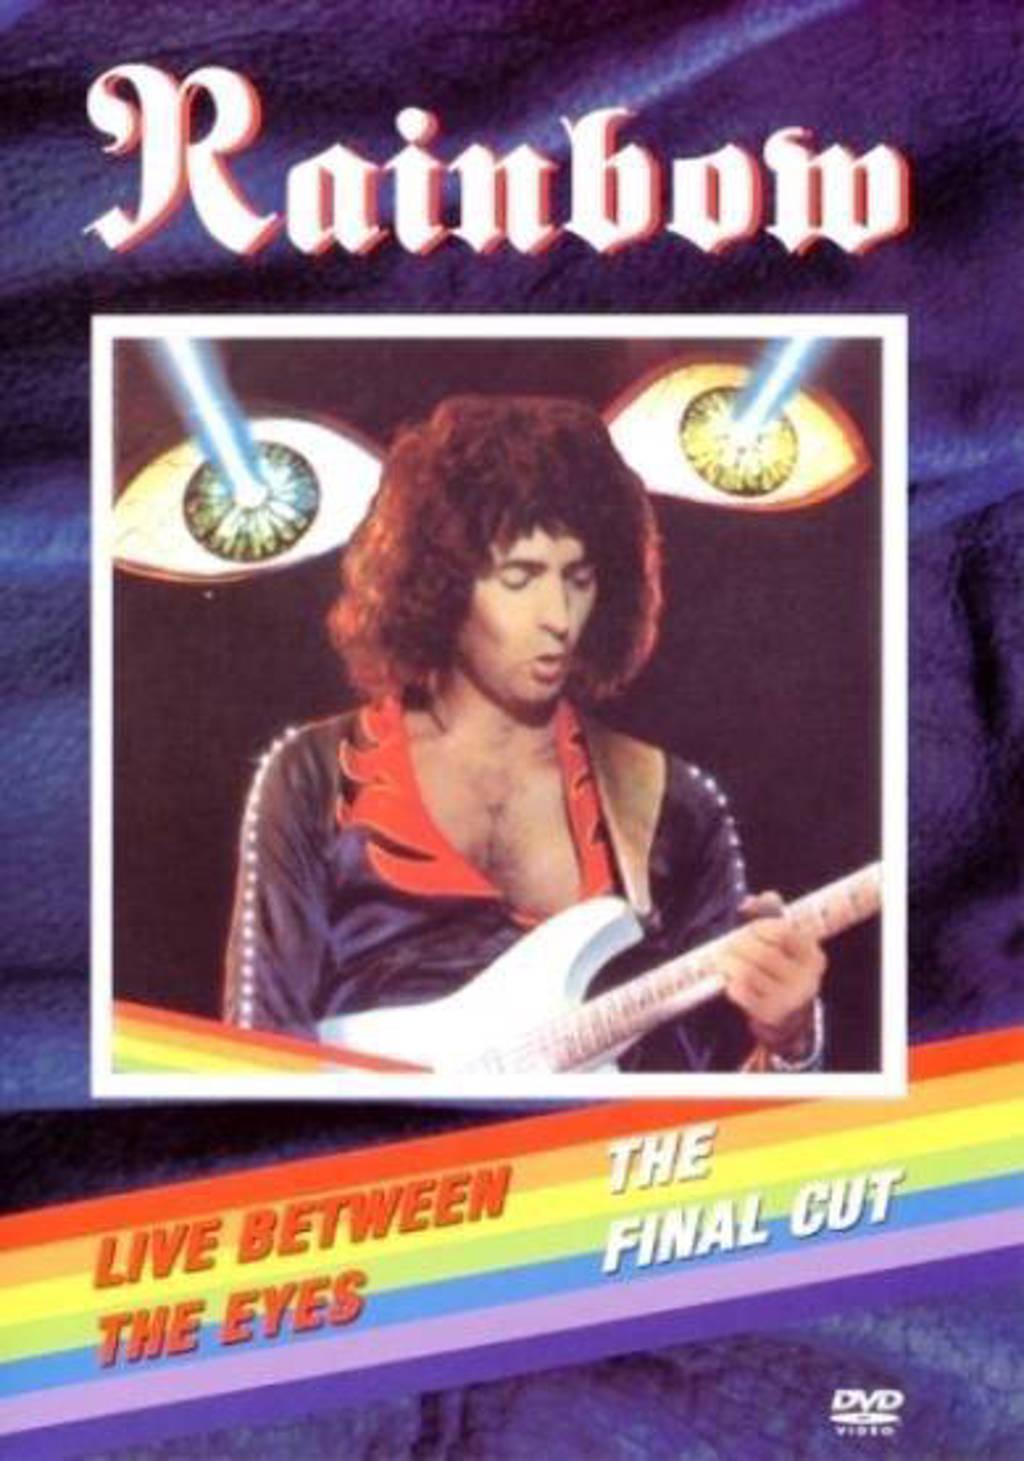 Rainbow - Final cut live between the eyes (DVD)